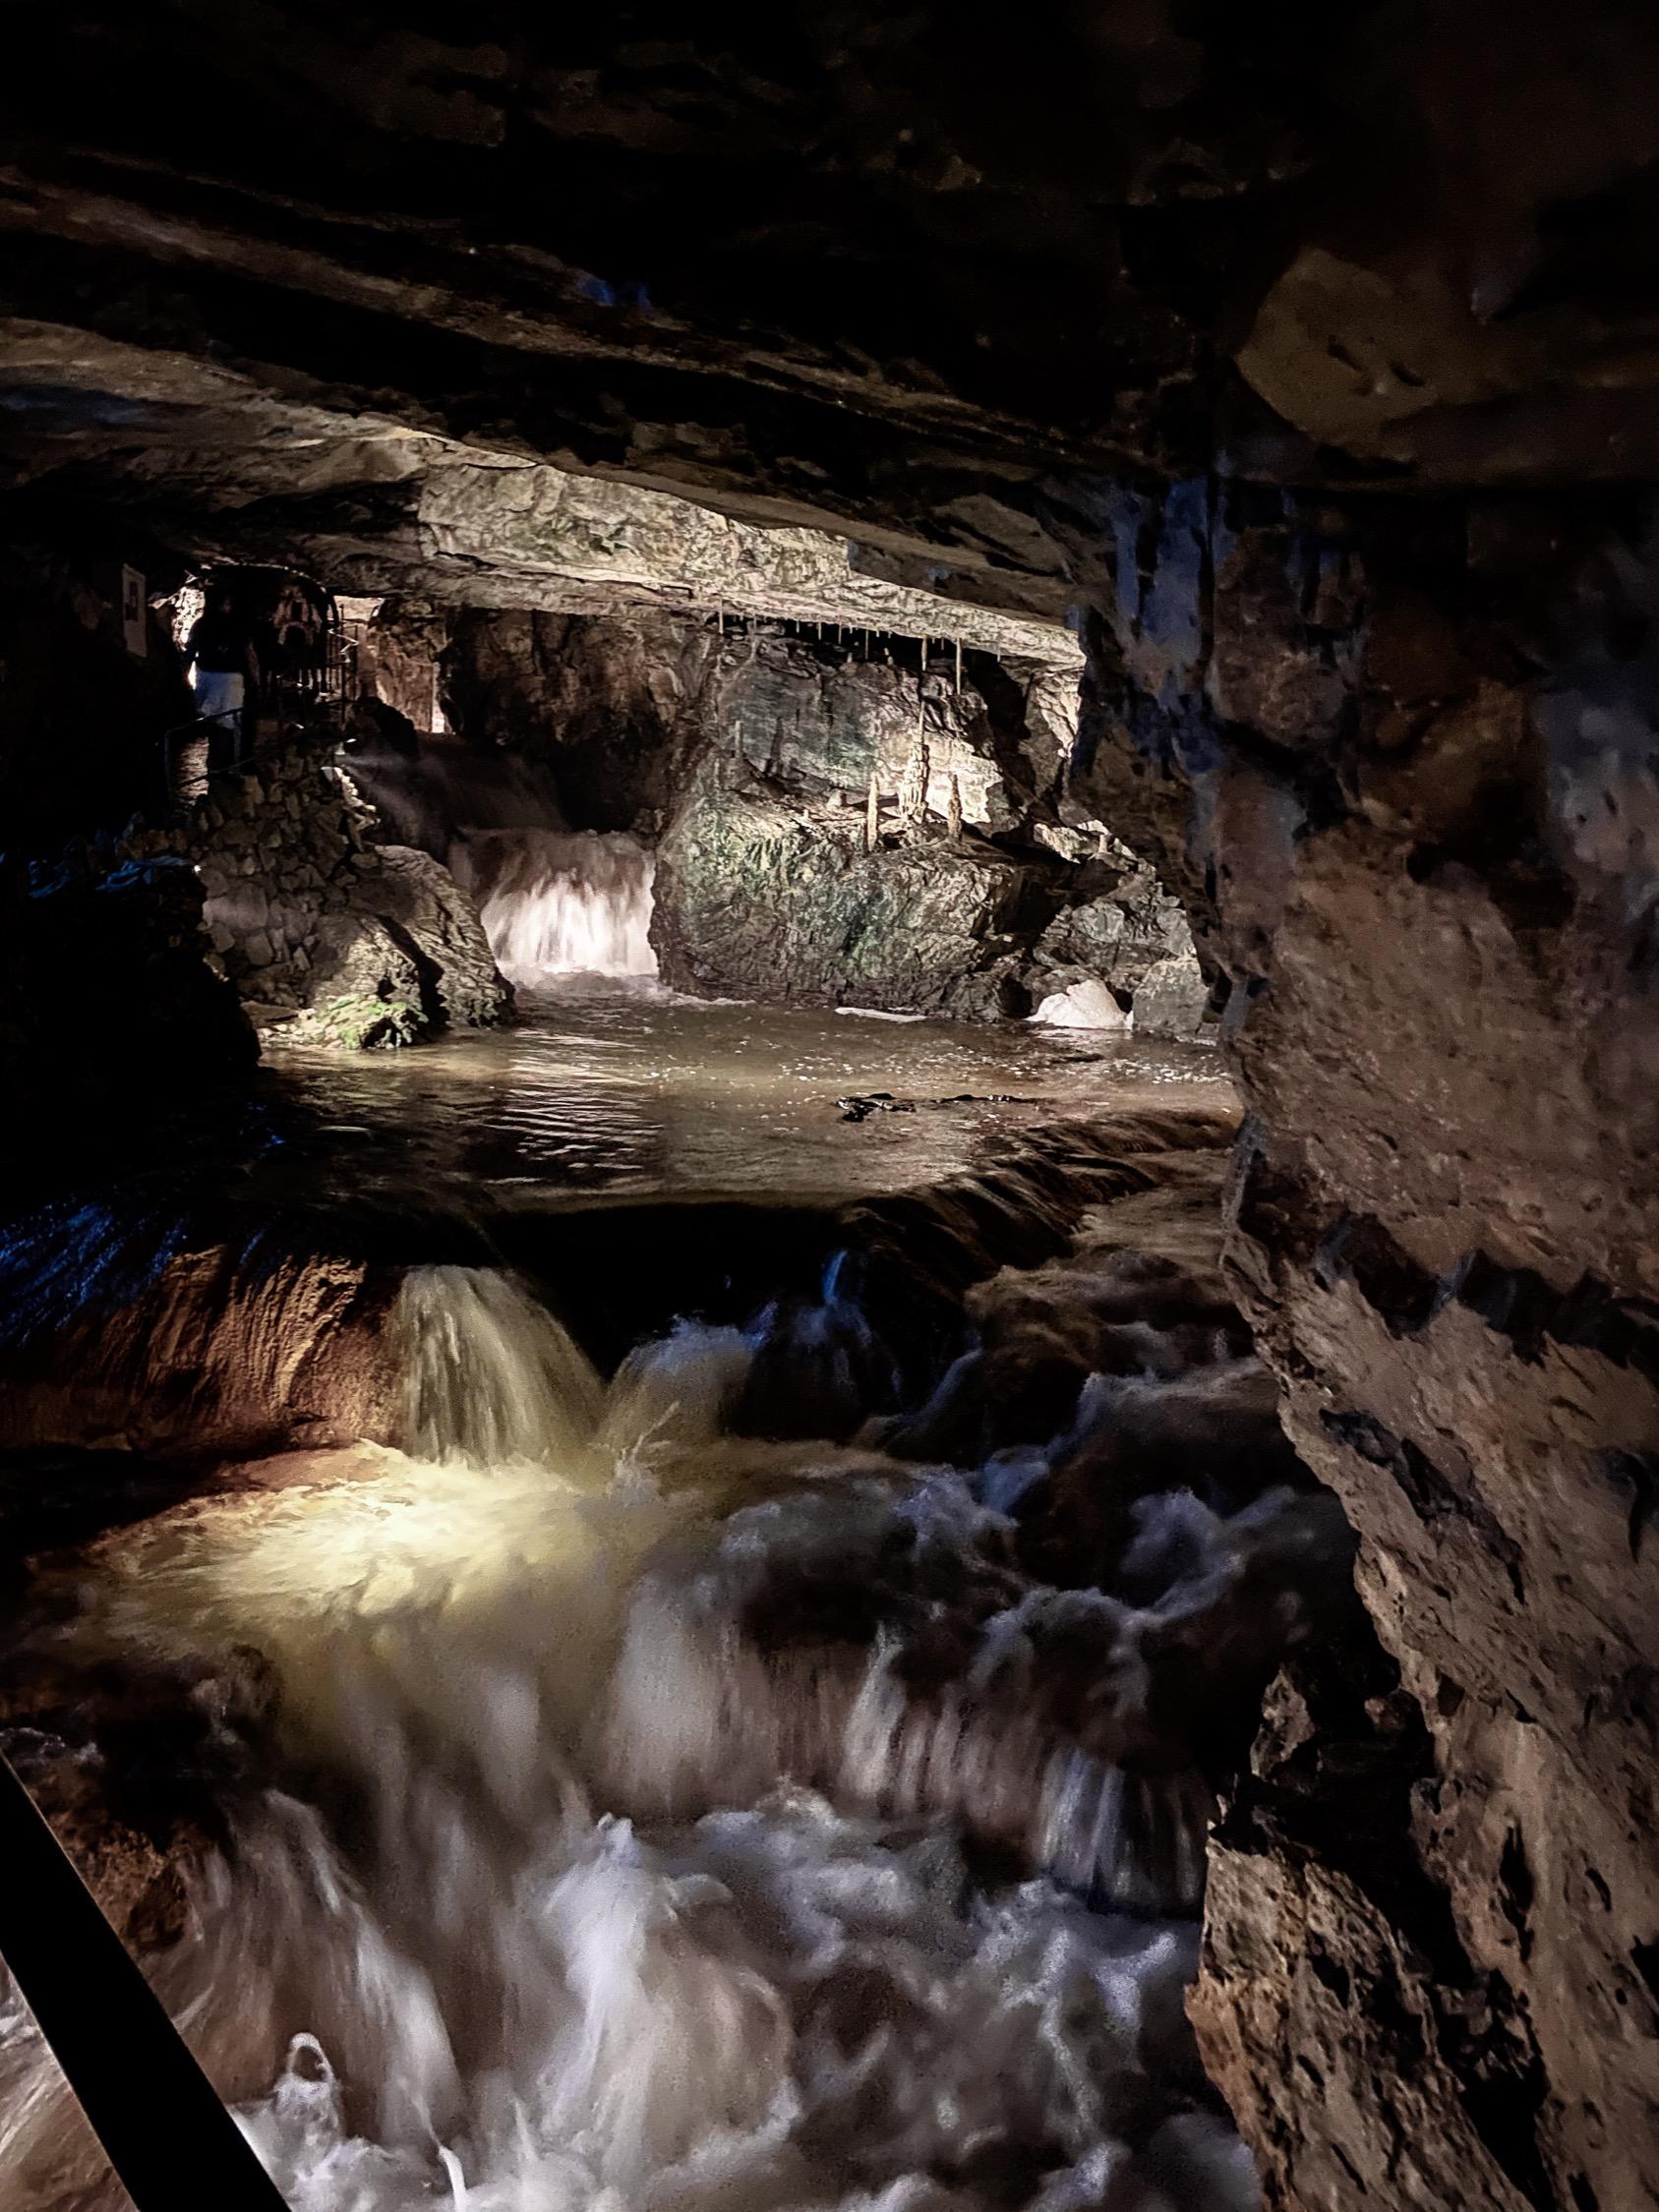 St. Beatus Caves